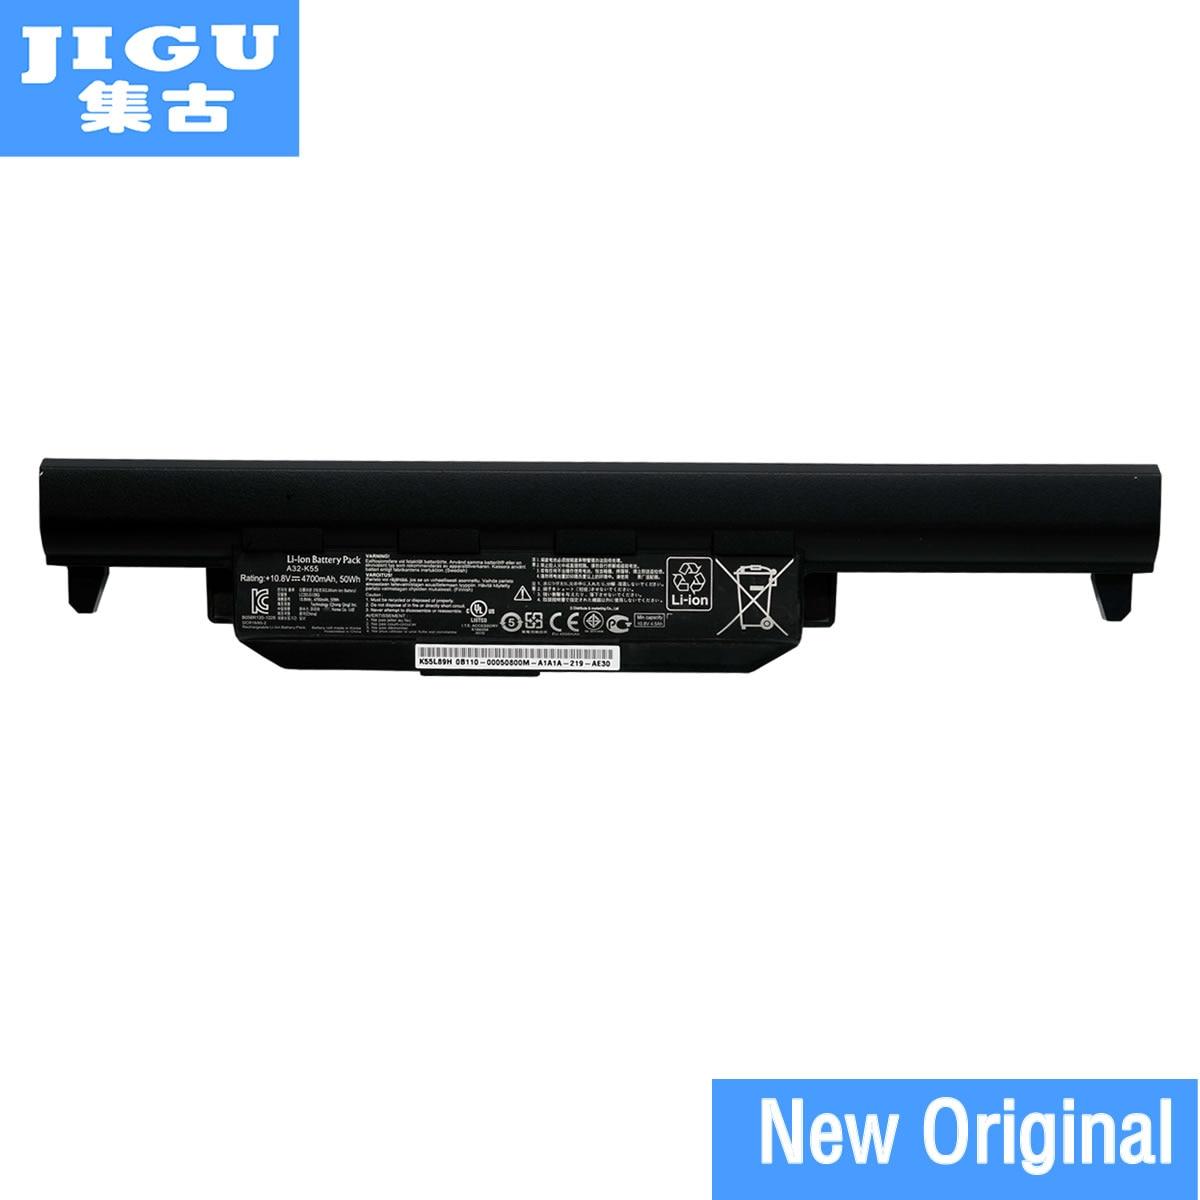 JIGU Original laptop Battery A32-K55 For Asus X45 X45A X45C X45V X45U X55 X55A X55C X55U X55V X75 X75A X75V X75VD U57 U57A U57V